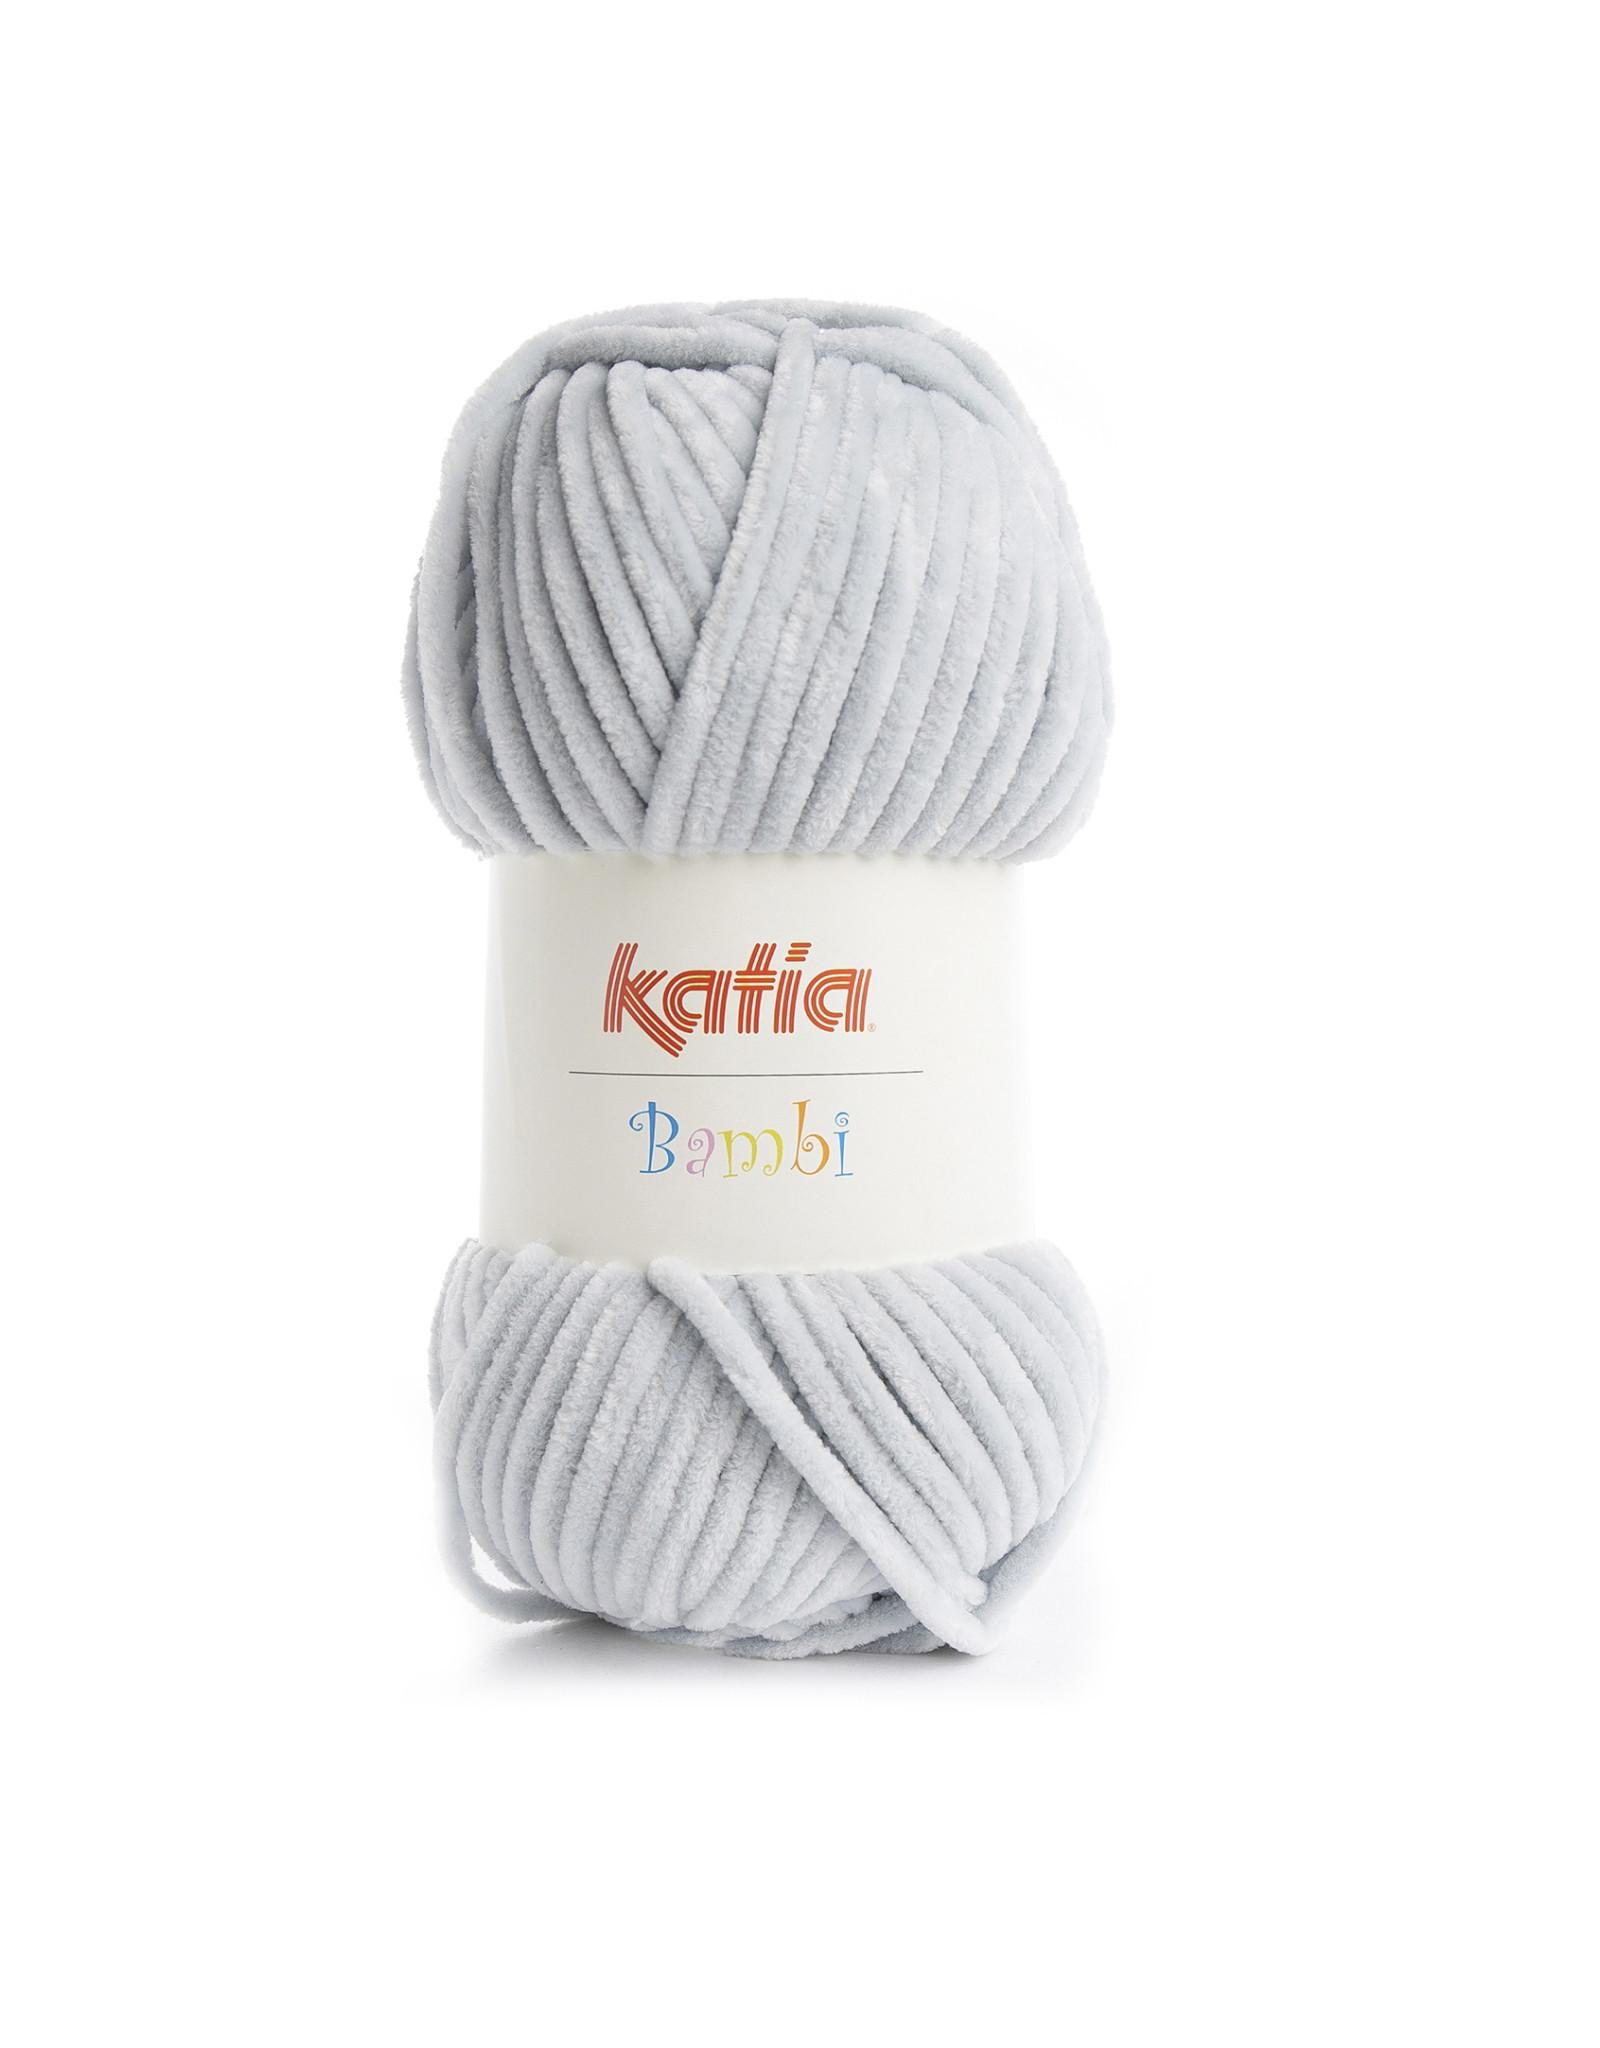 Katia Katia Bambi 325 - Parelmoer-lichtgrijs